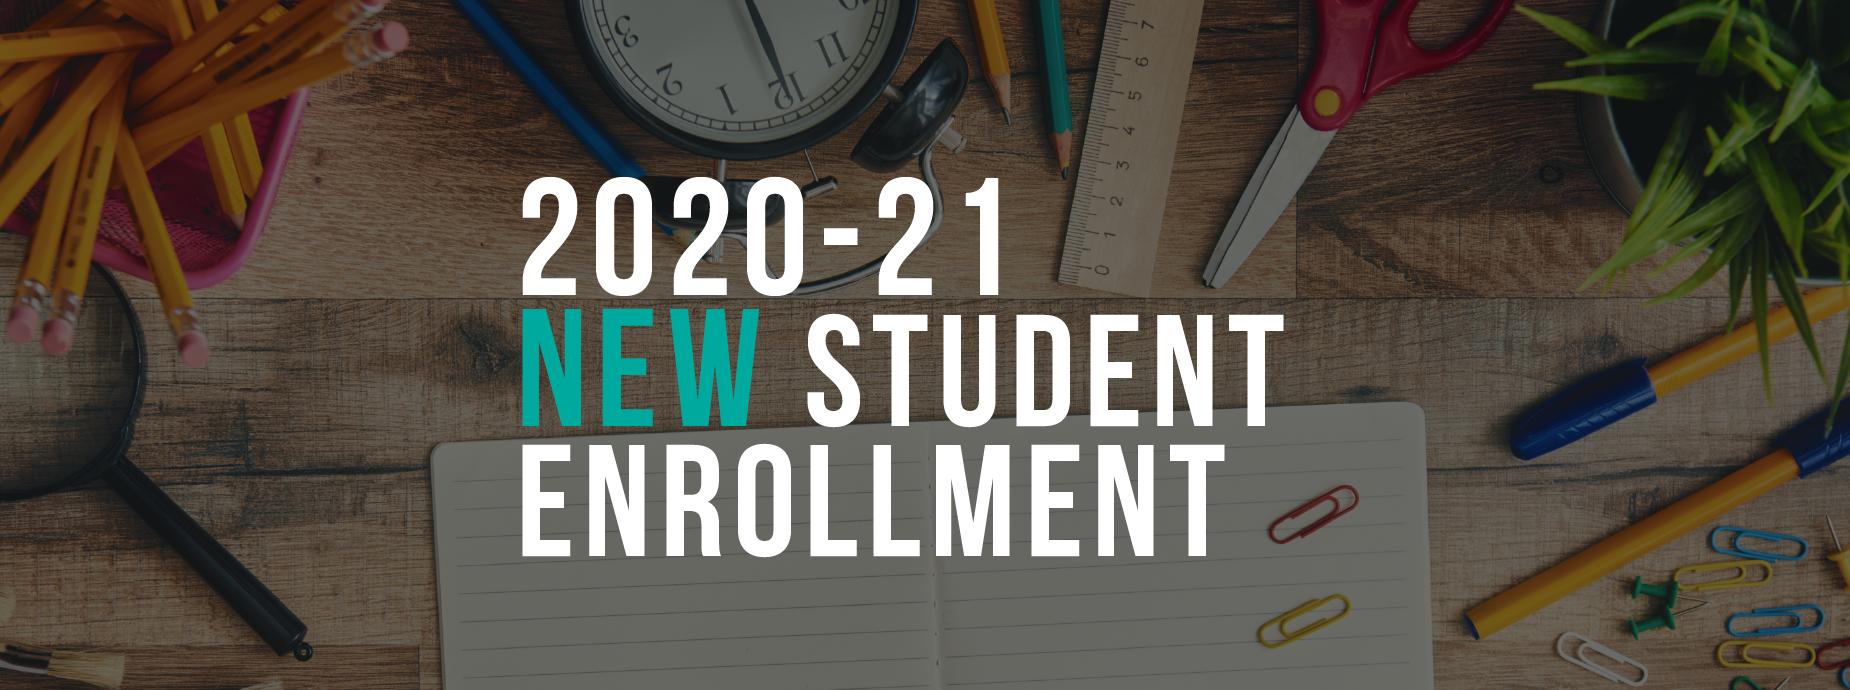 New Student Enrollment Banner